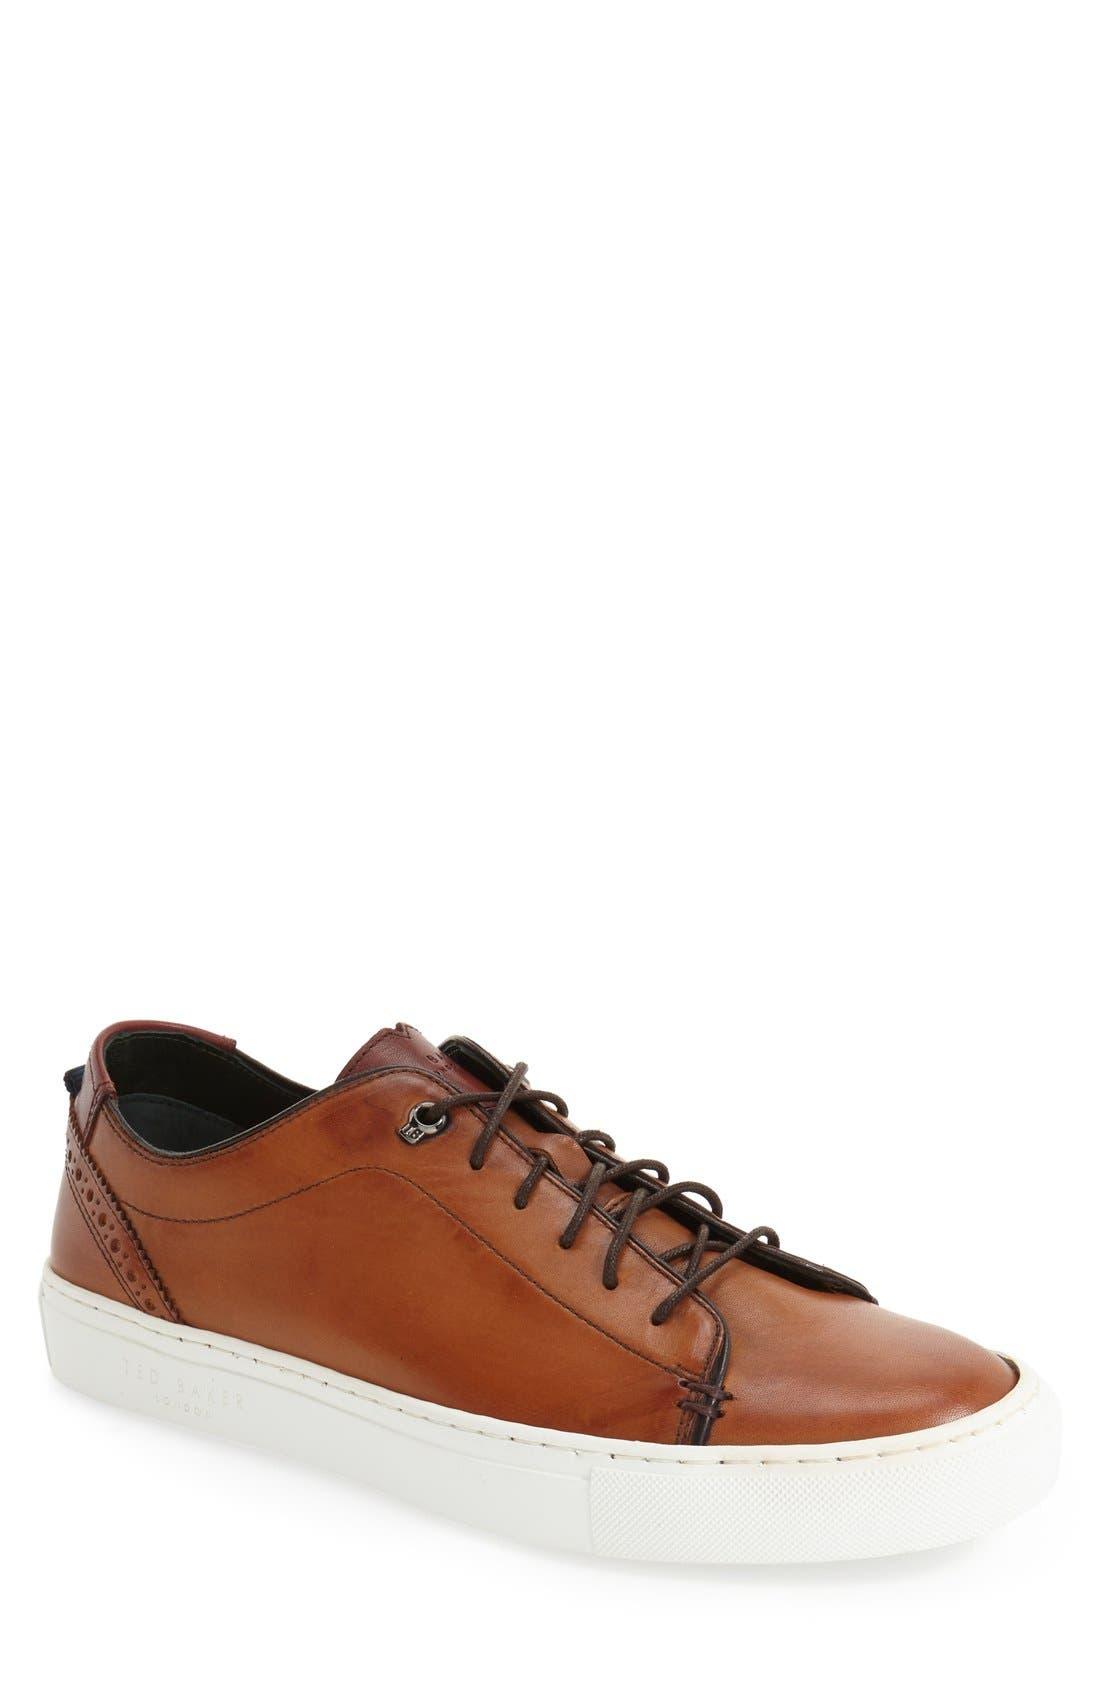 'Kiing Classic' Sneaker,                             Main thumbnail 7, color,